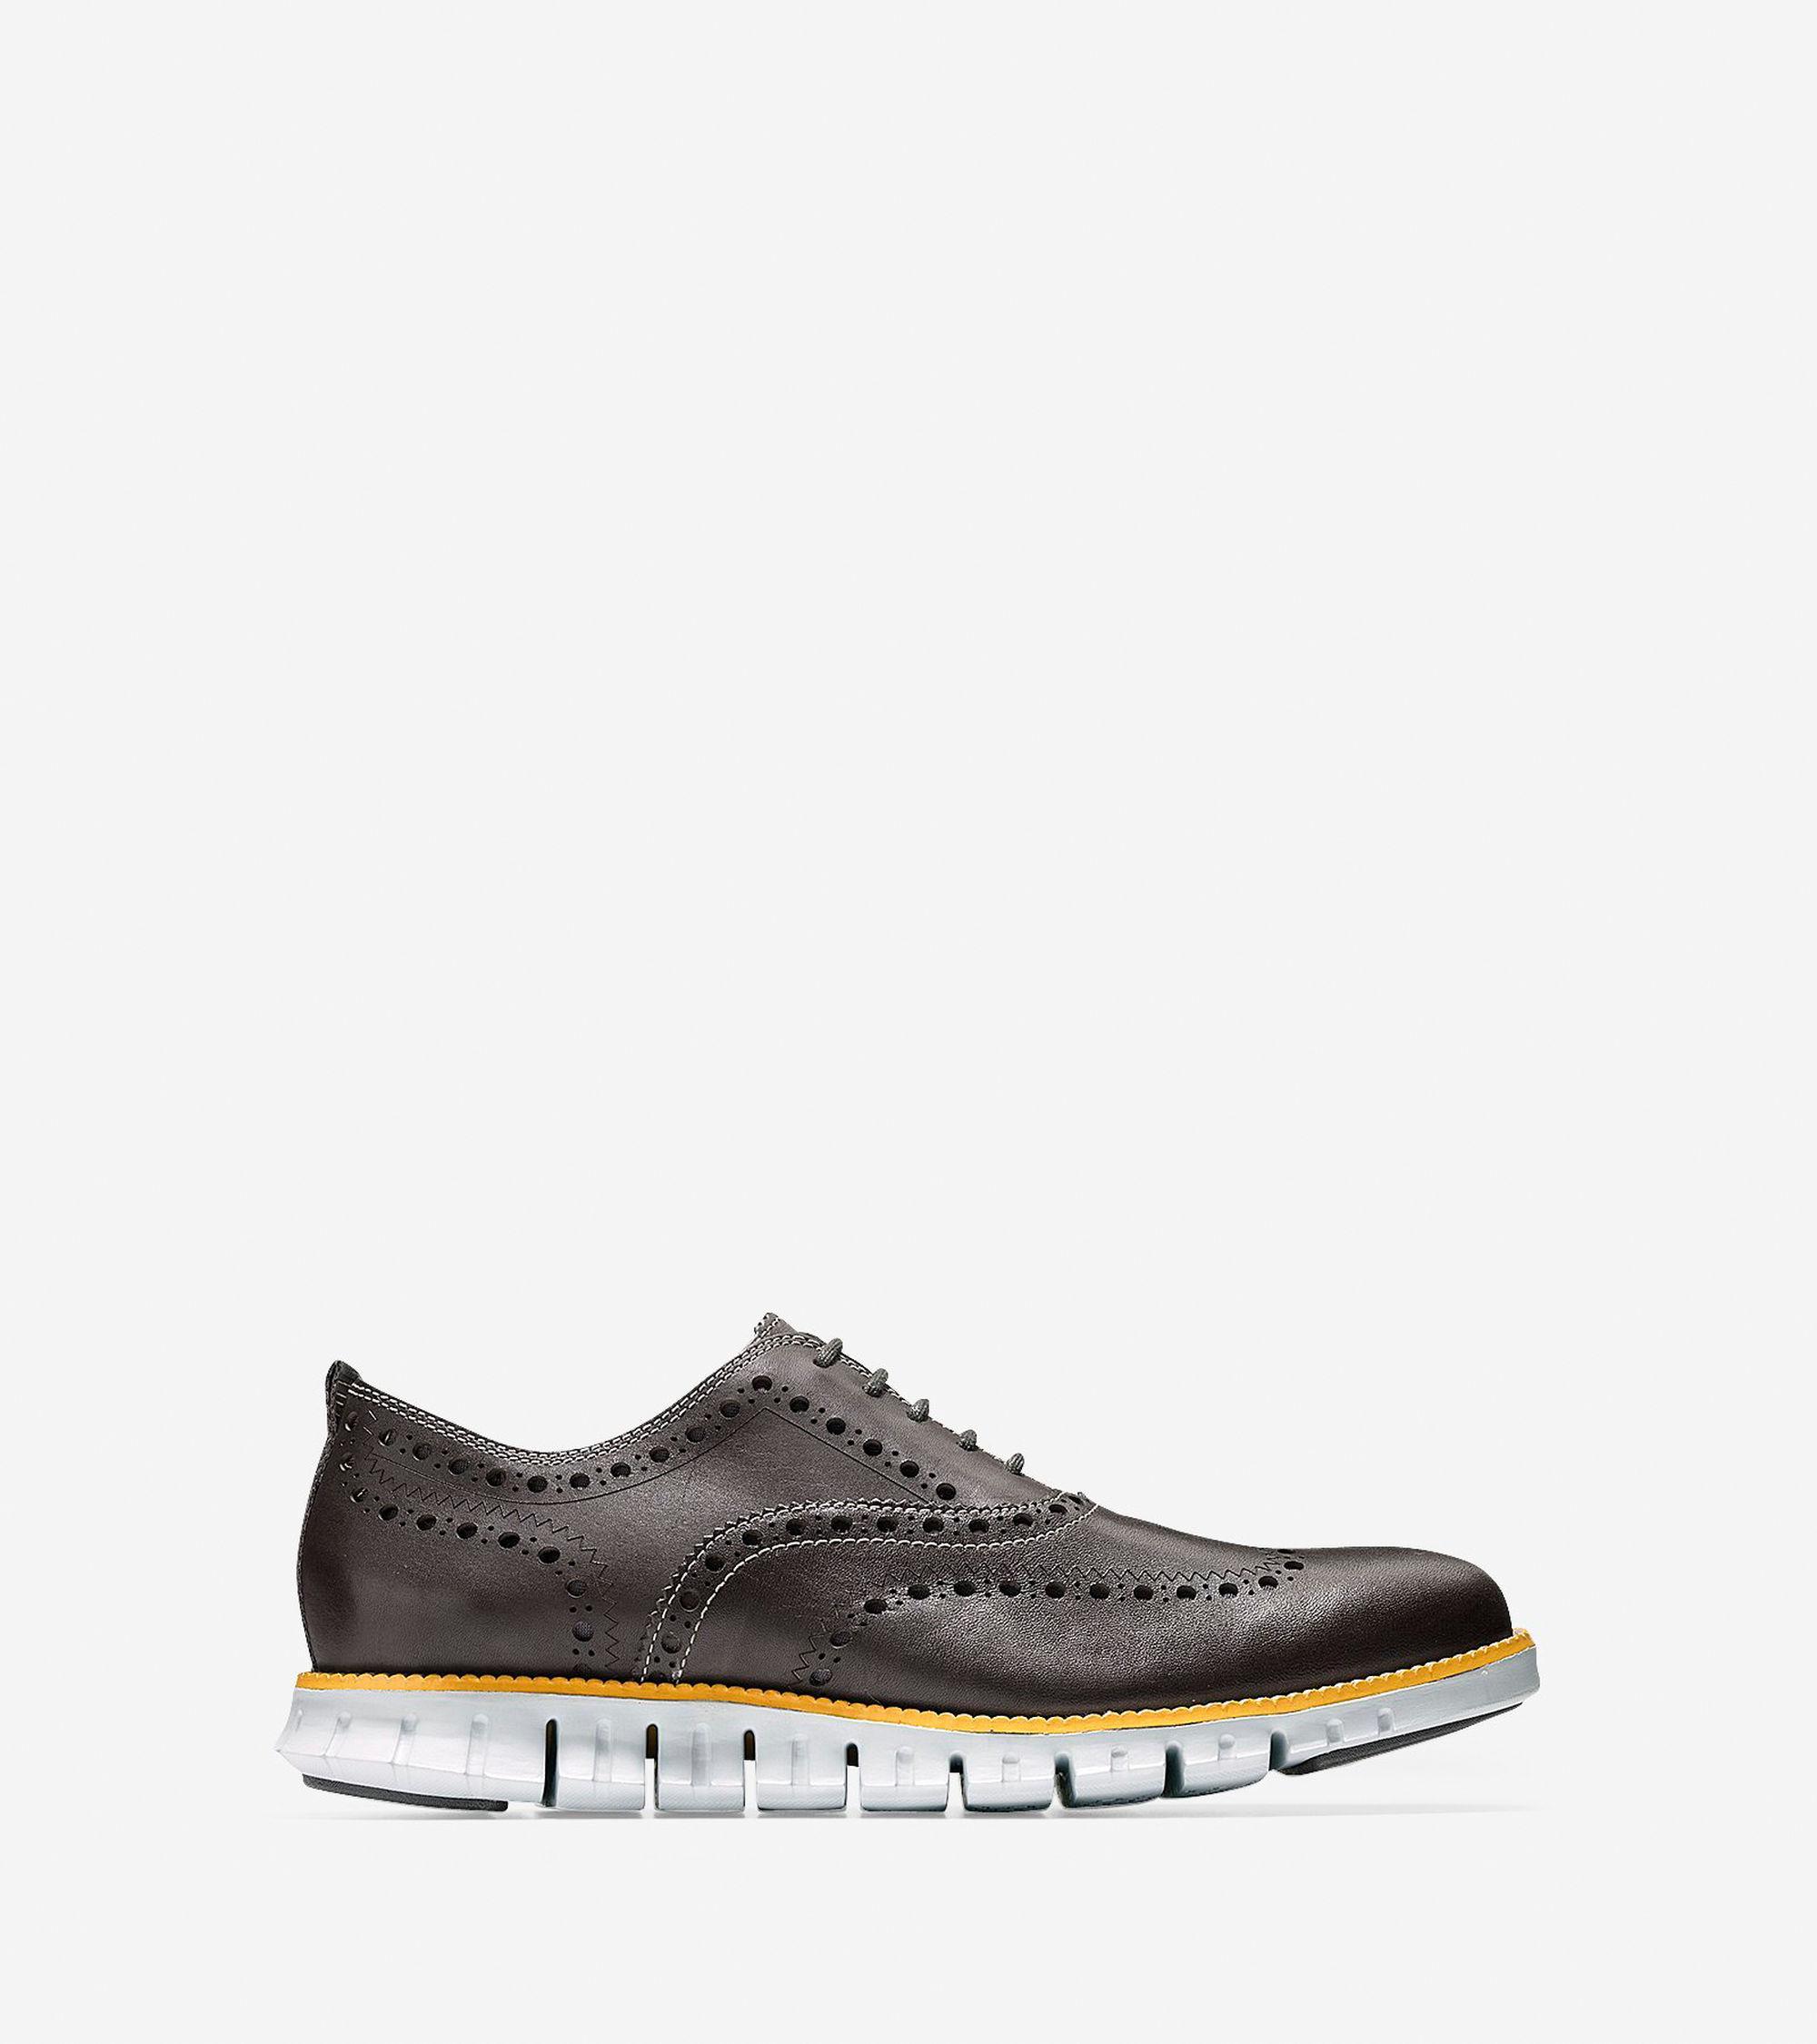 Mens Coach Shoes Nordstrom